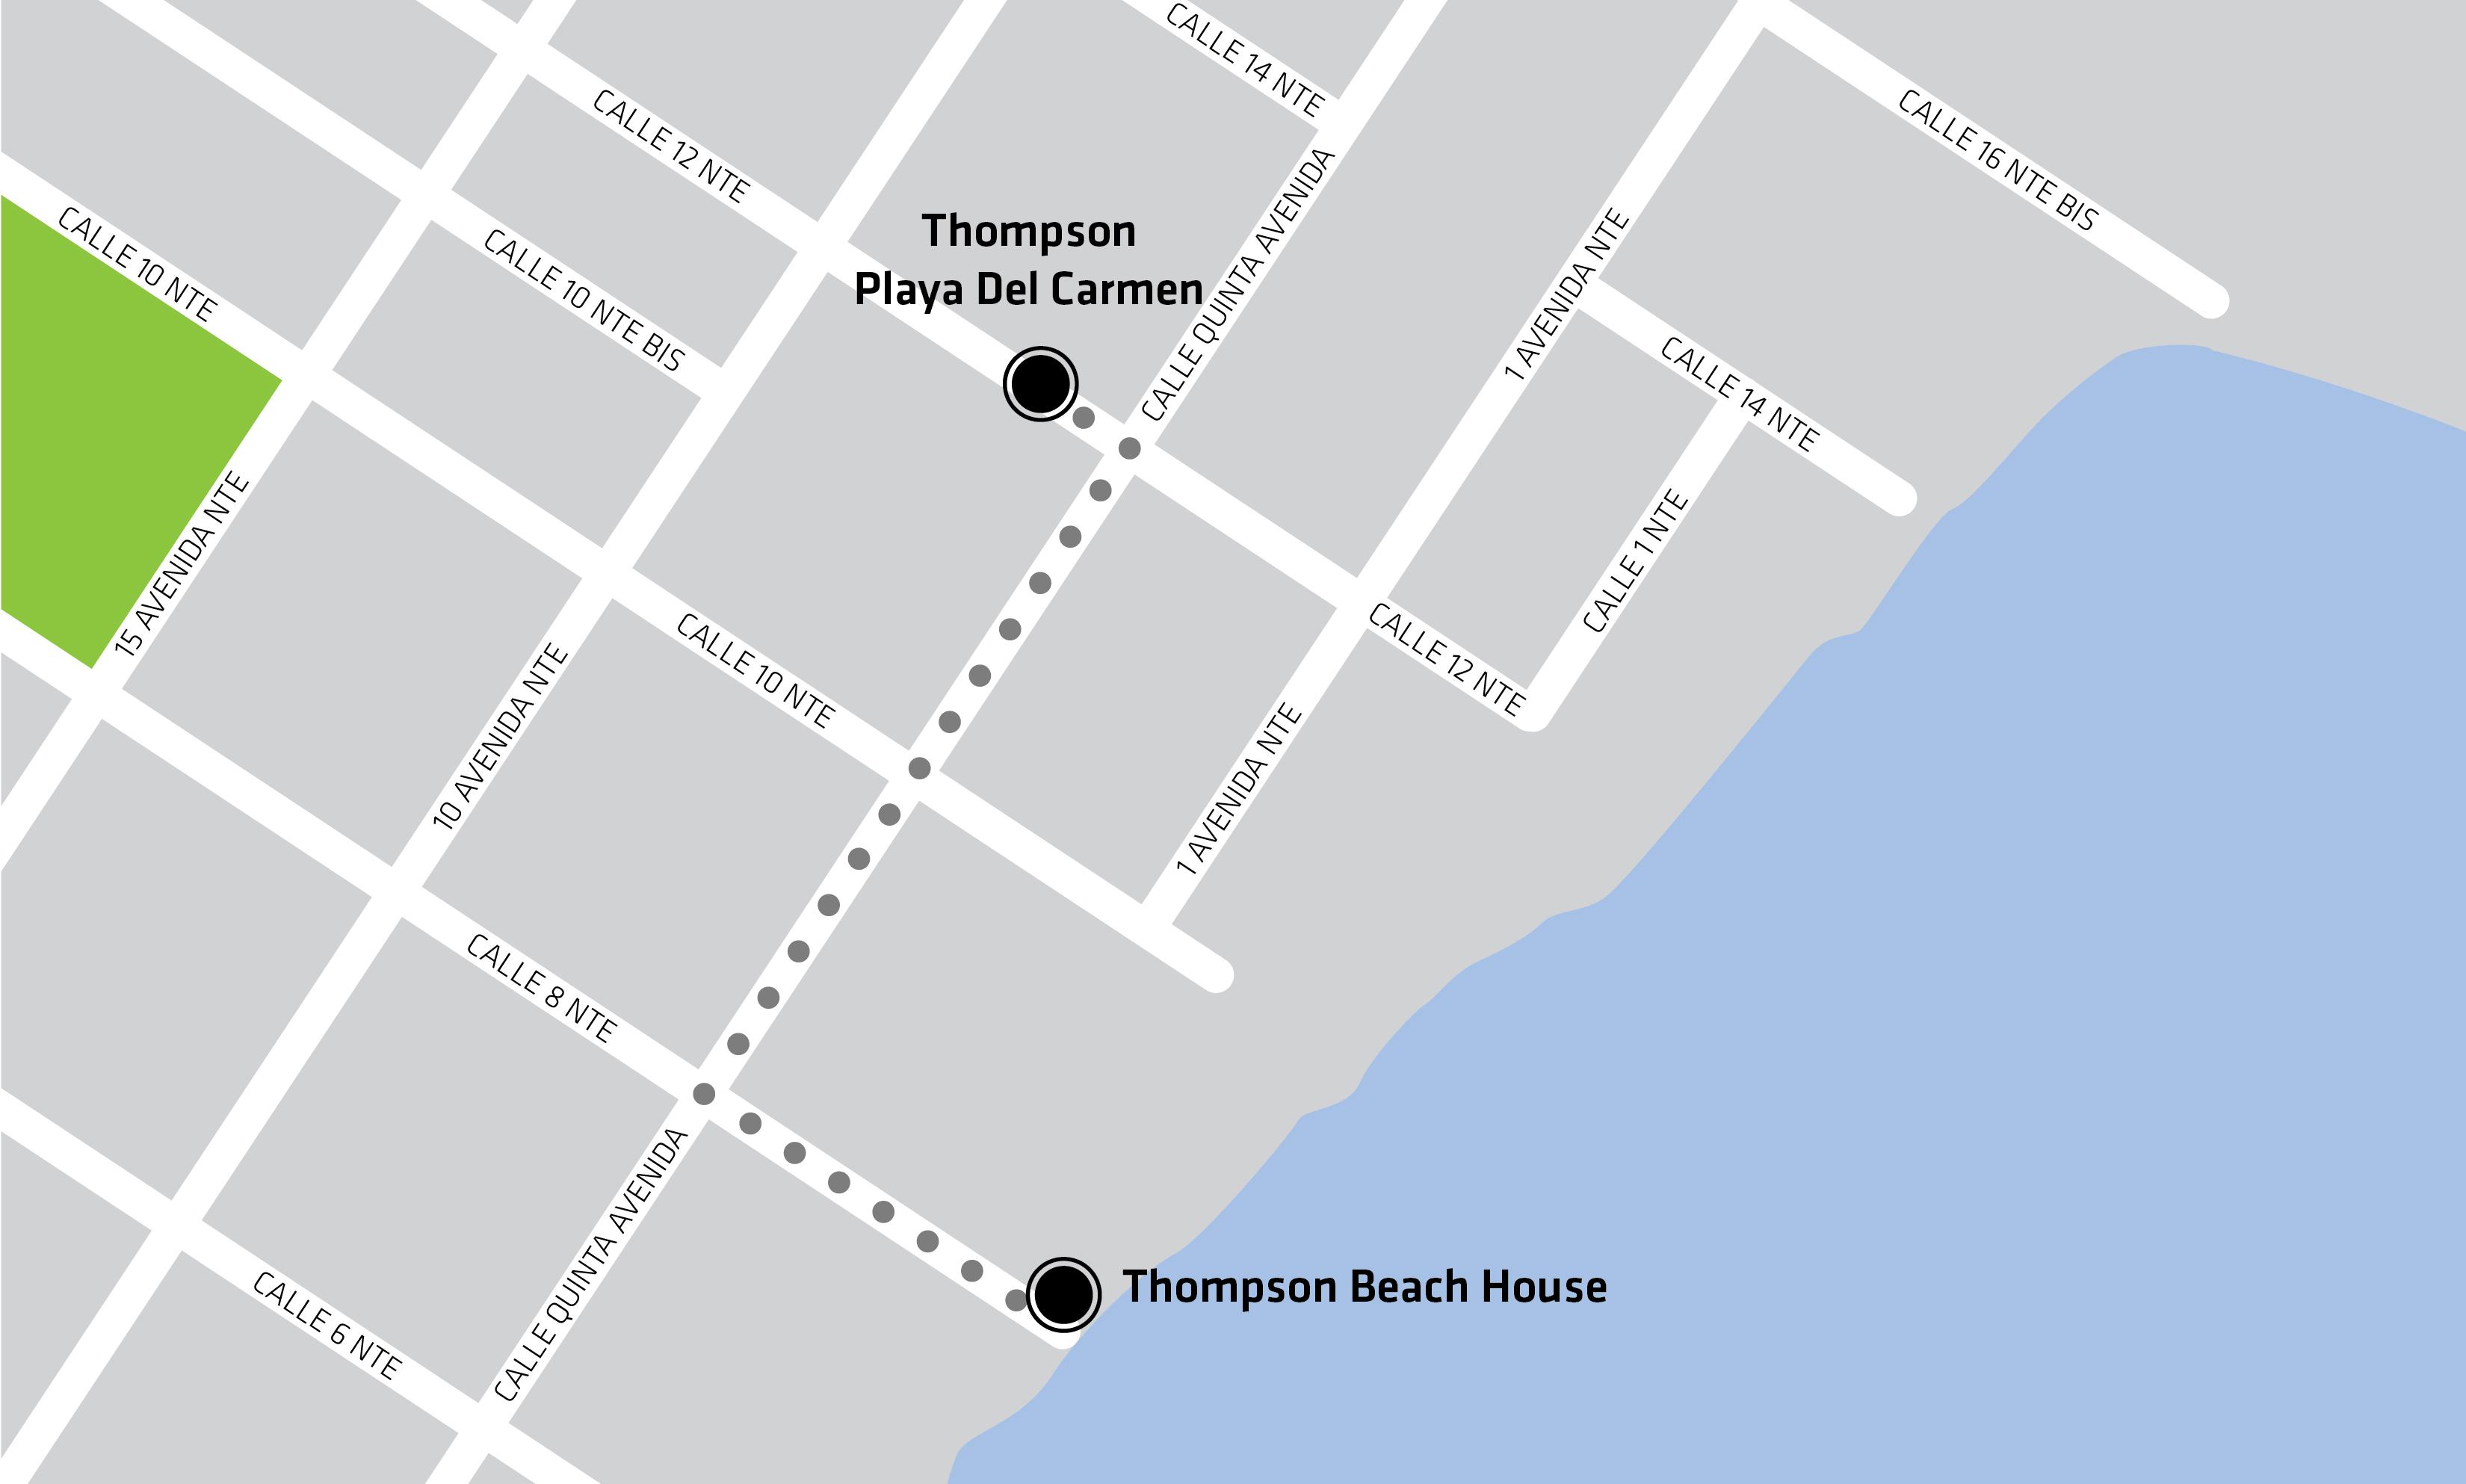 Playa del Carmen Beachfront Luxury Hotel Suites Thompson Playa del